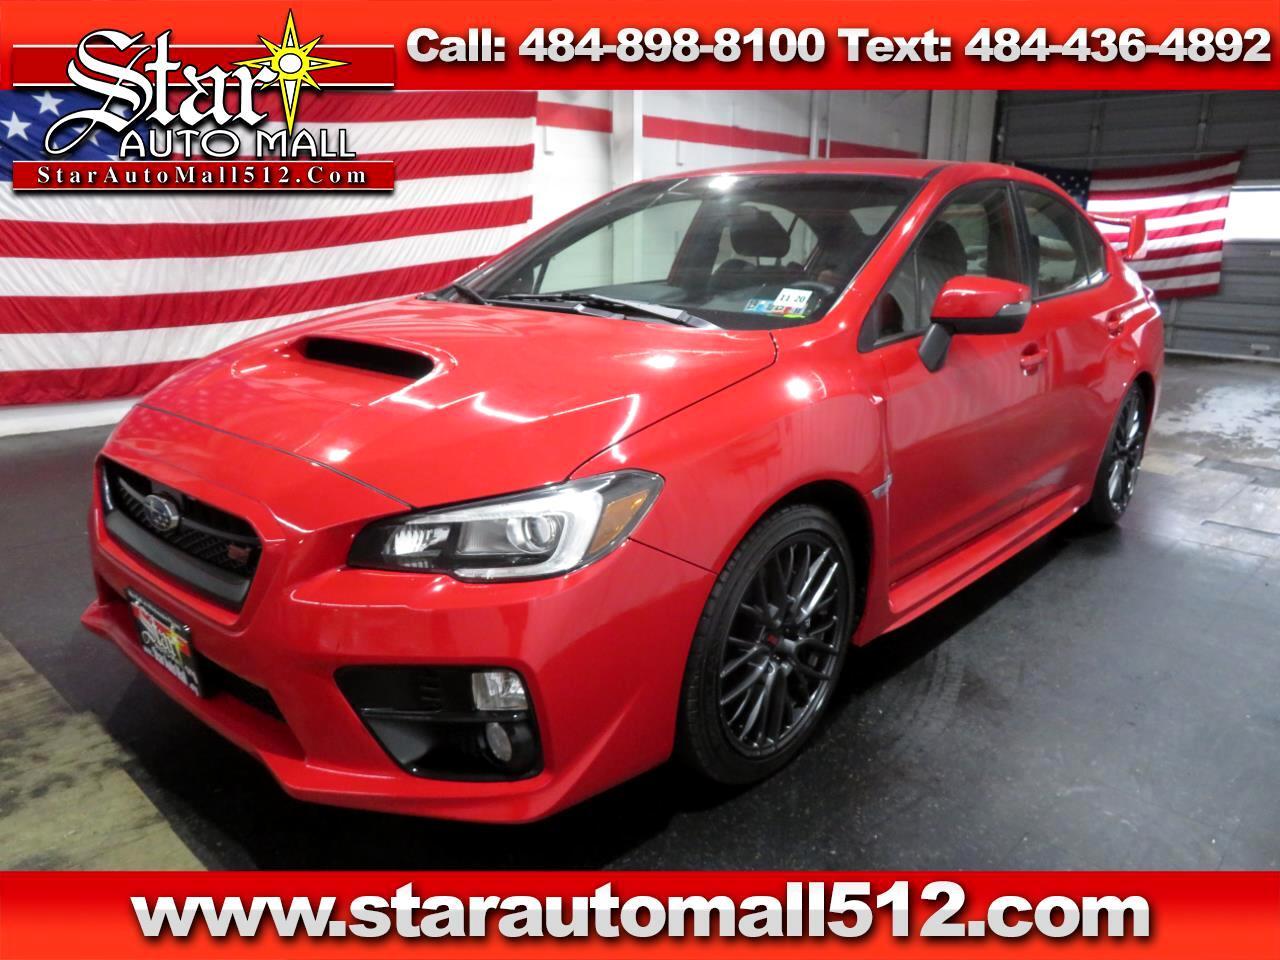 2016 Subaru Impreza WRX STI